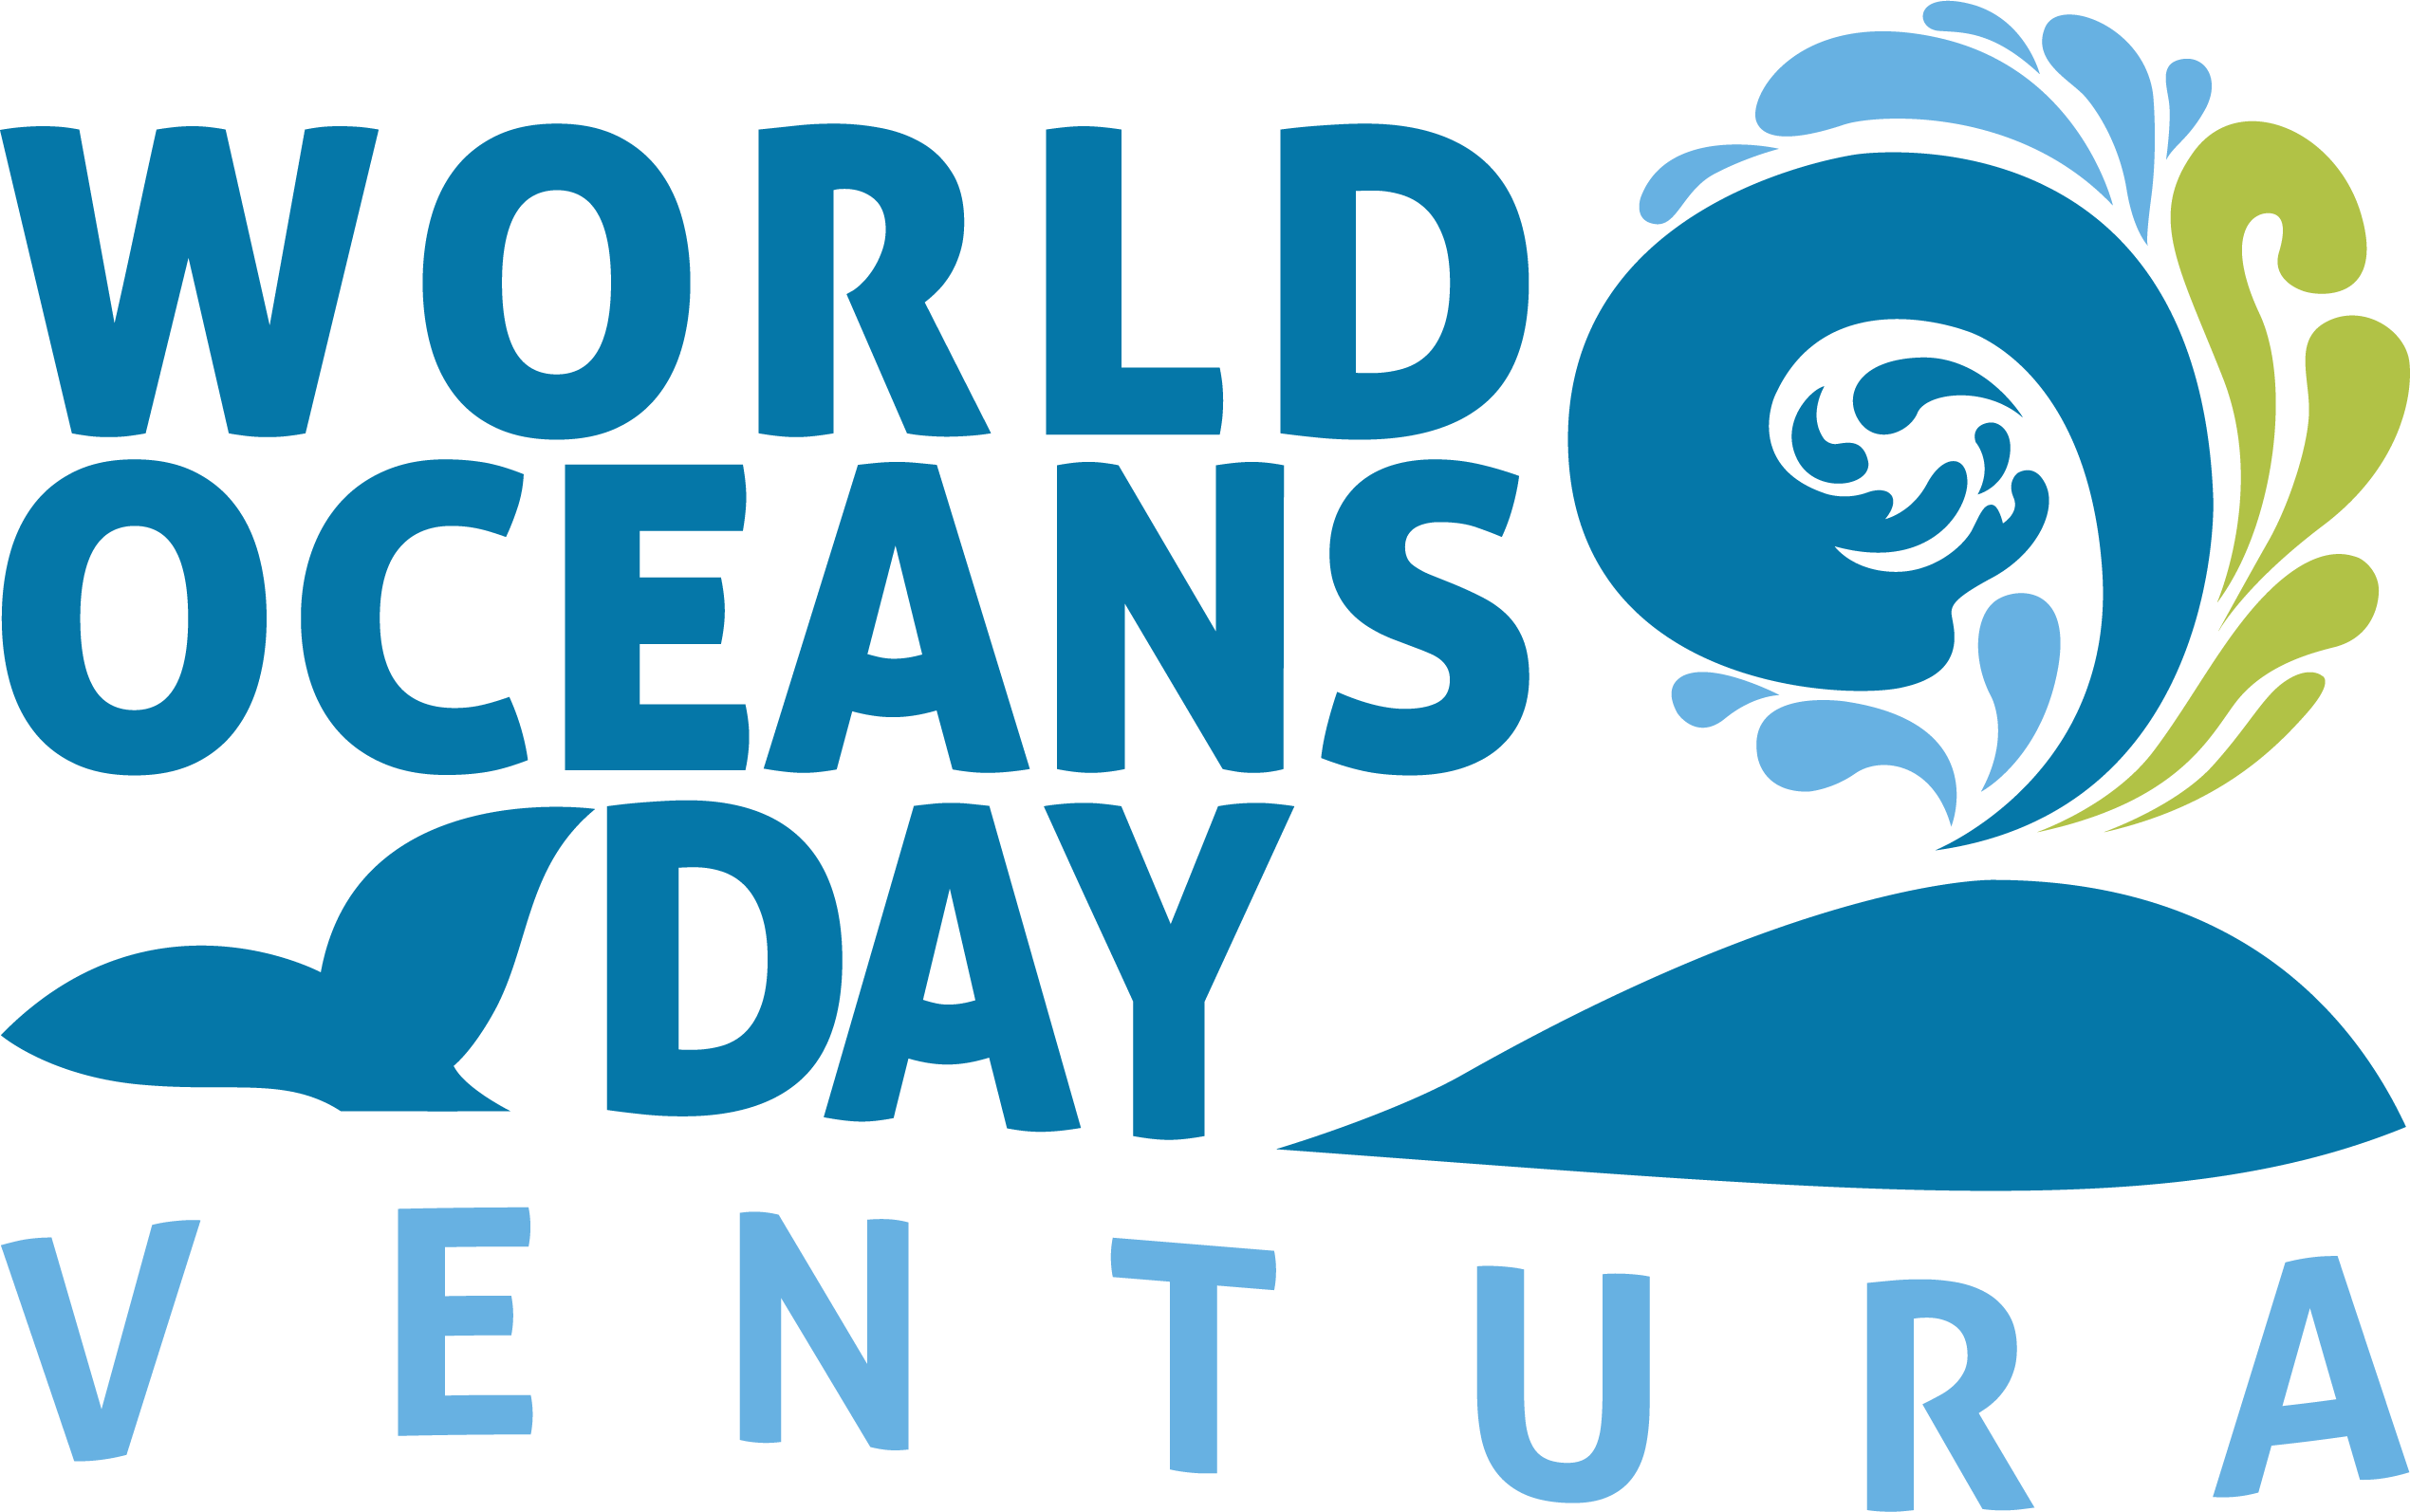 World Oceans Day Ventura